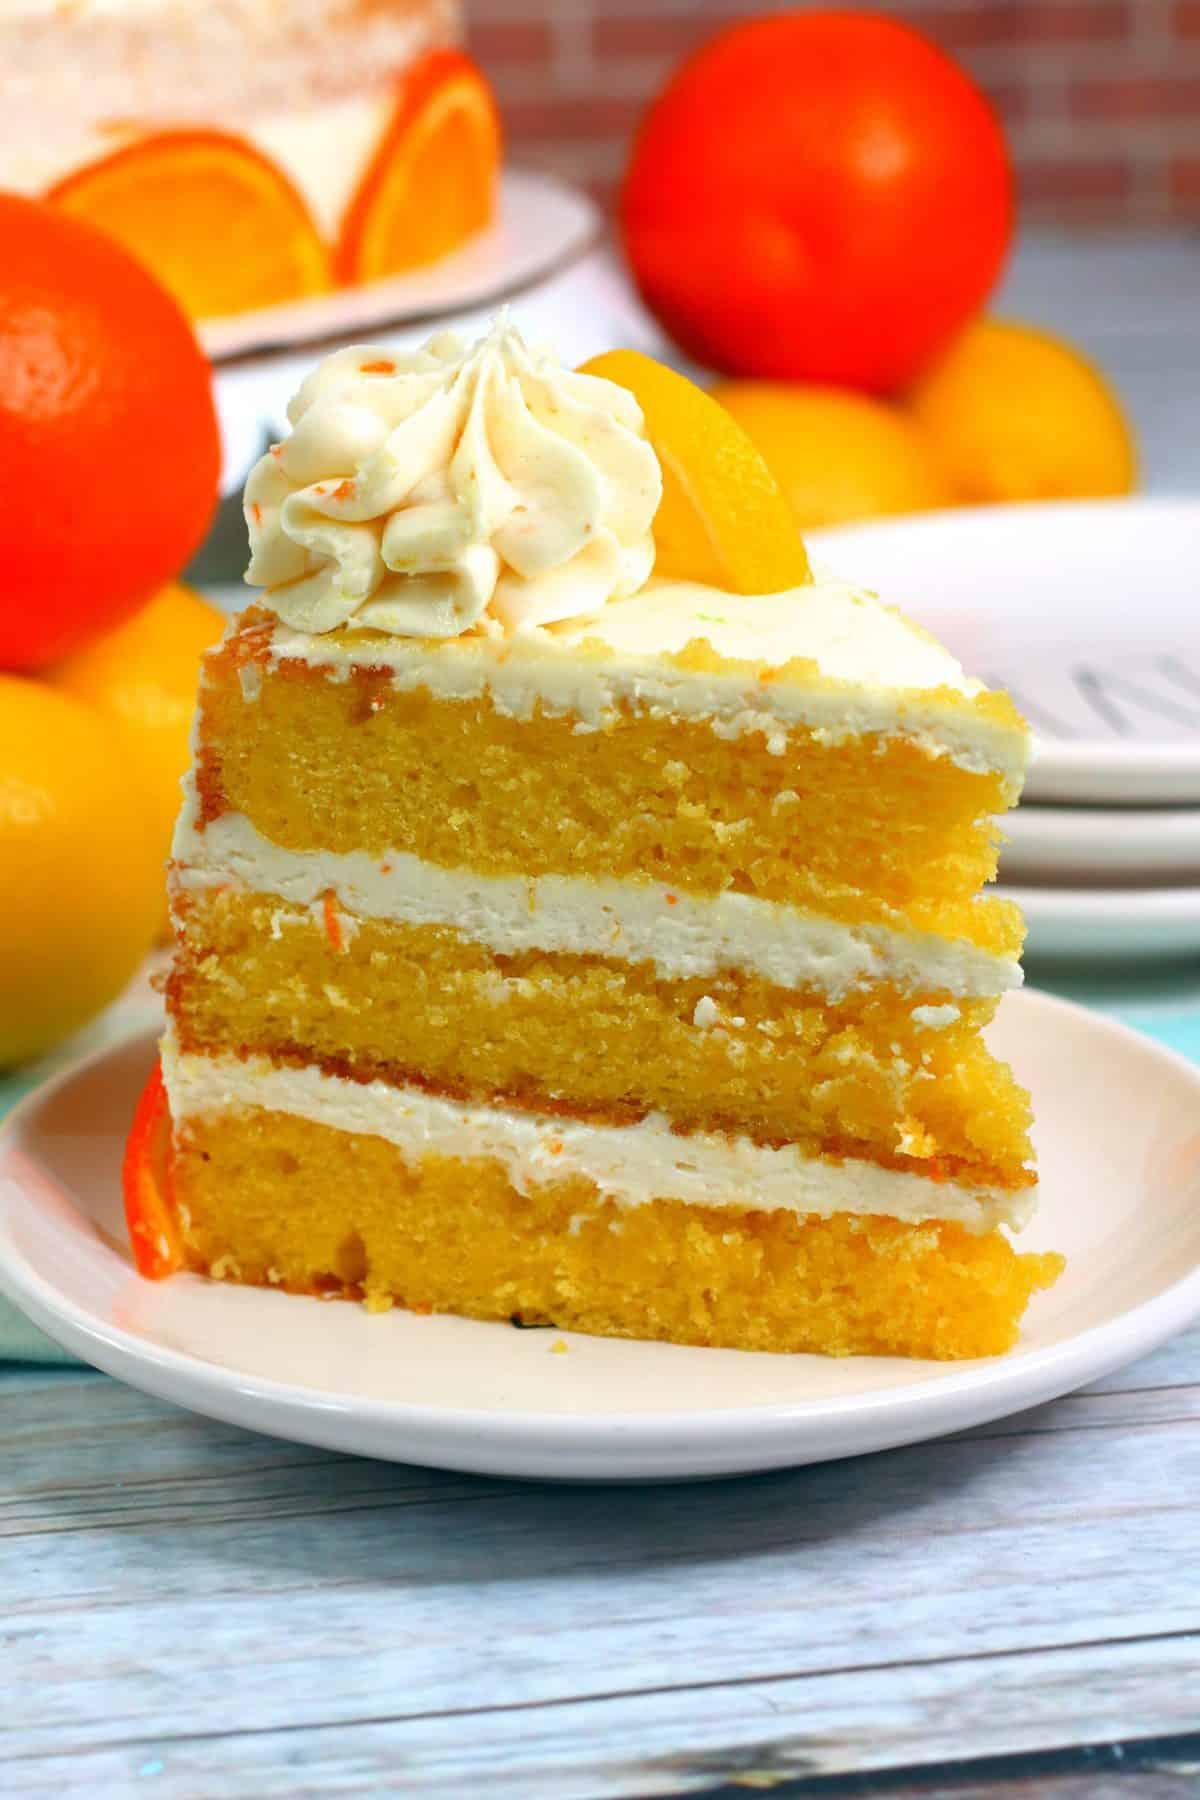 lemon cake recipe, layered lemon orange cake